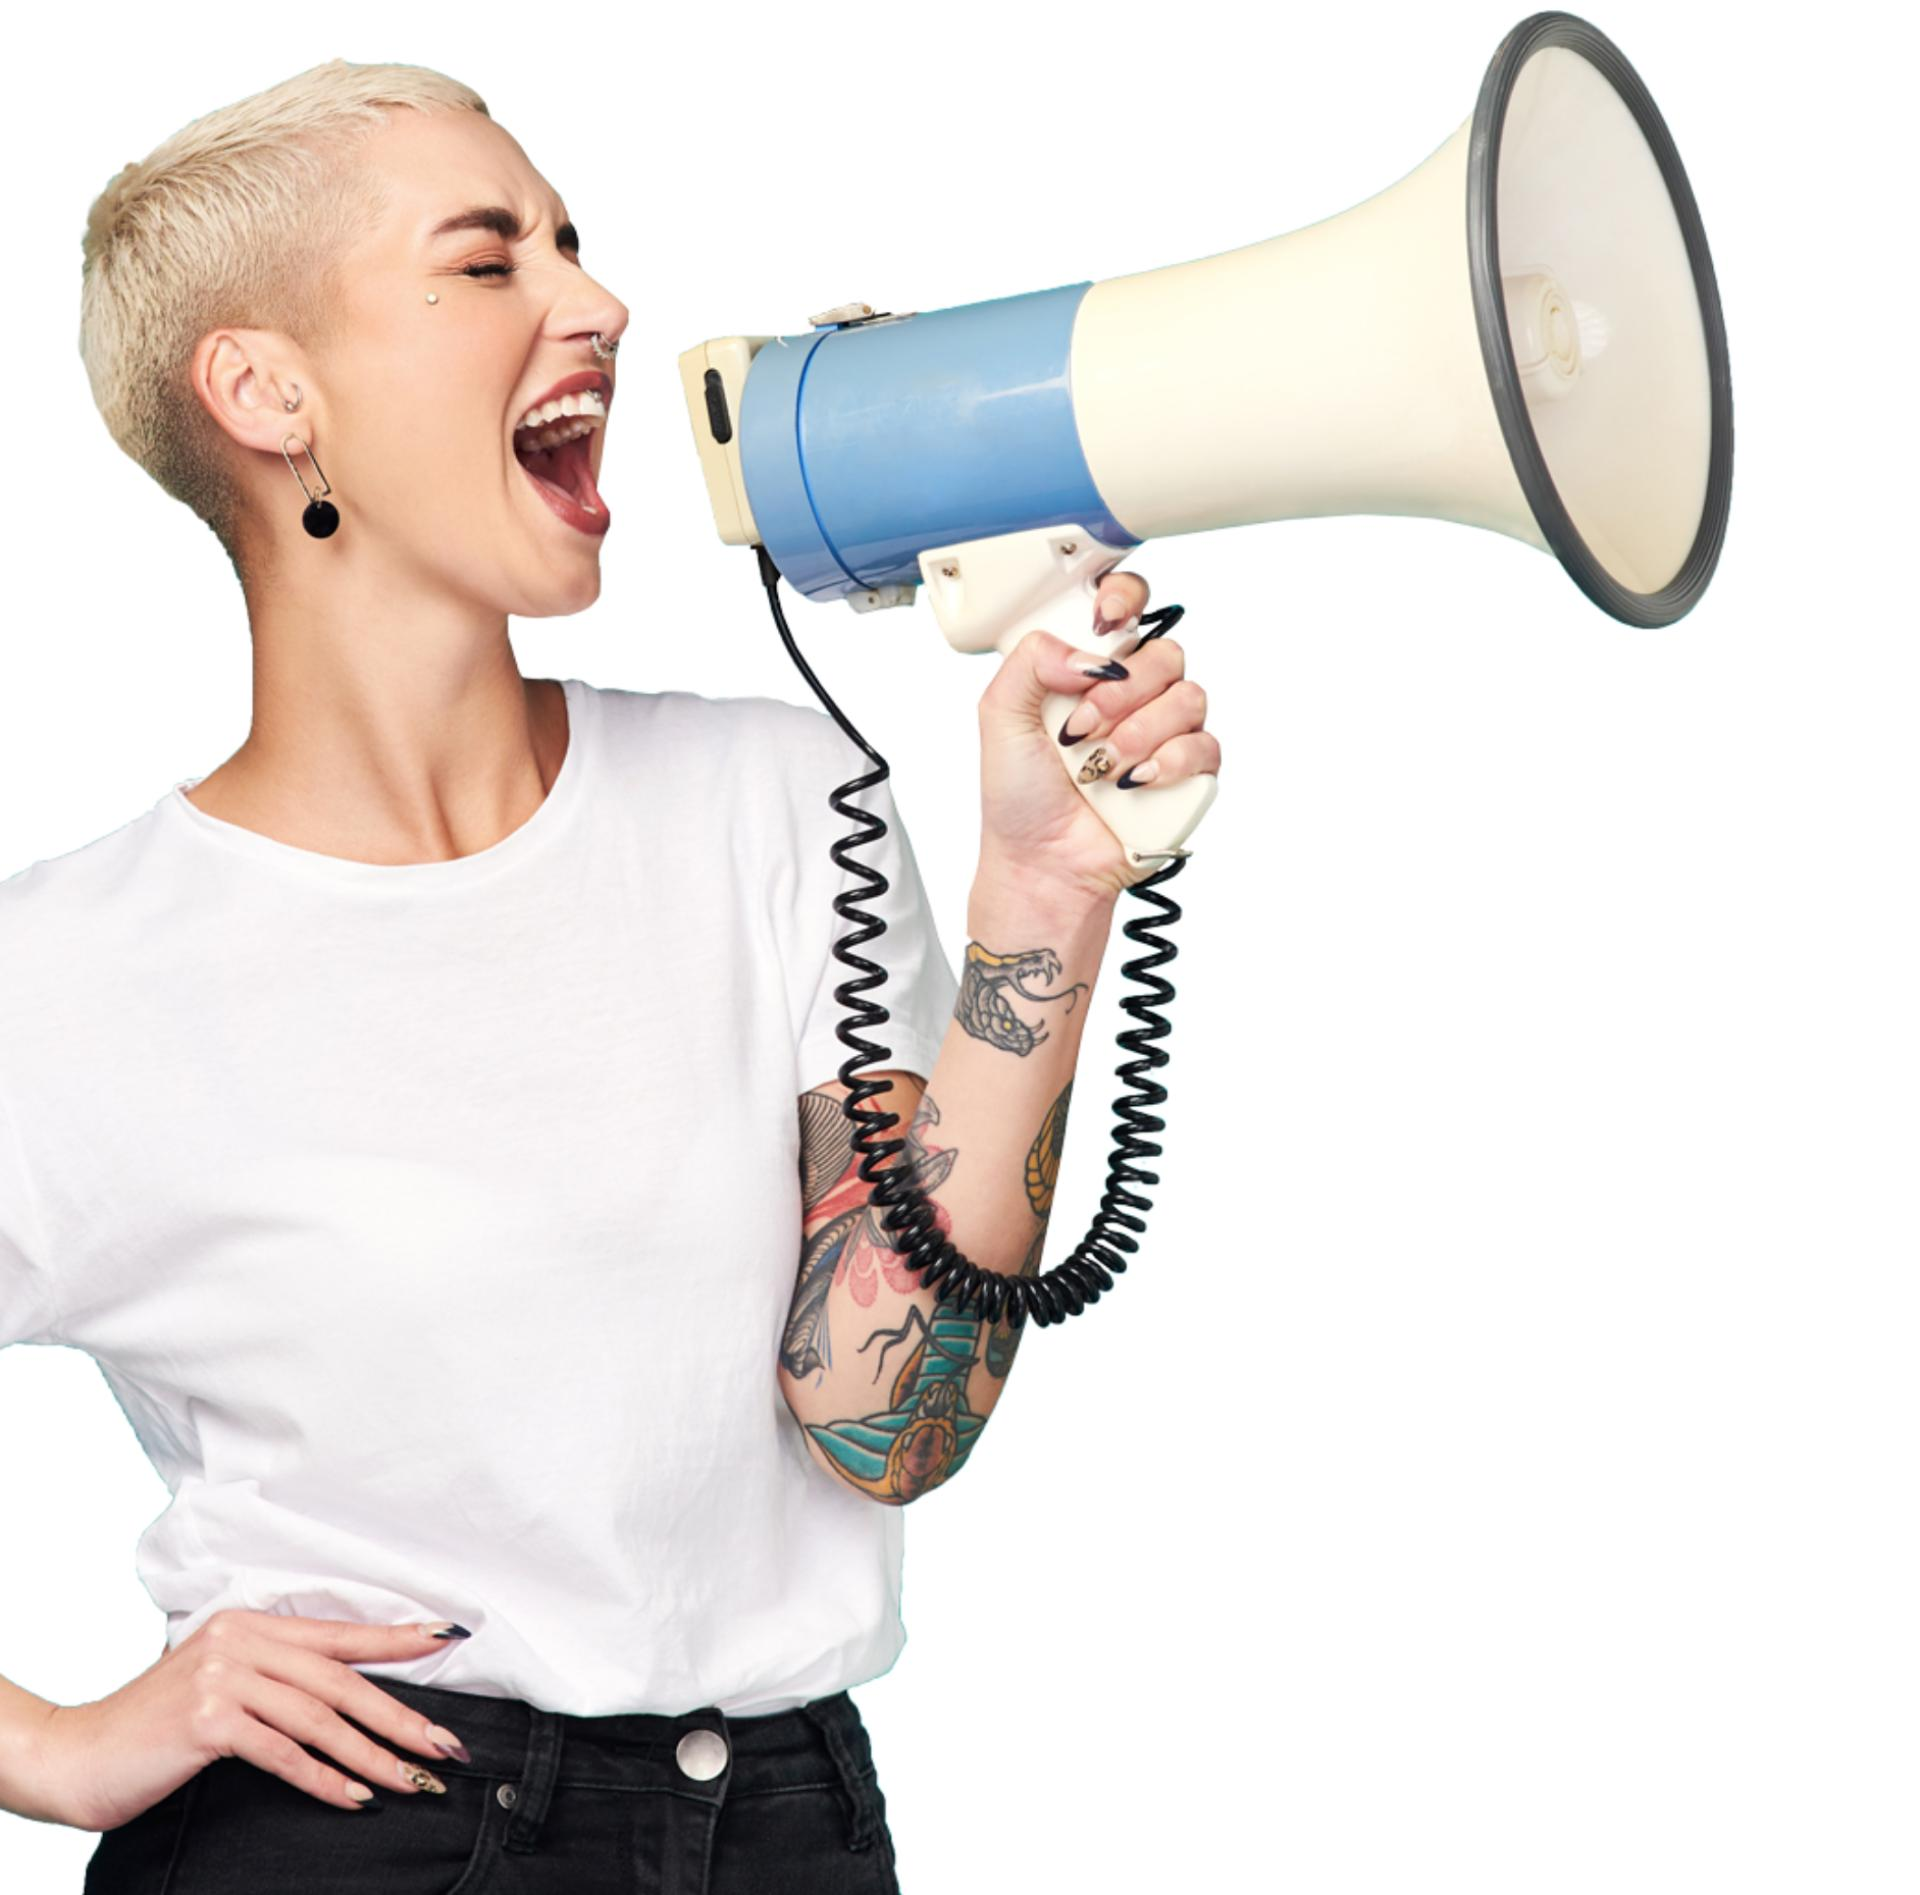 Image for women megaphone